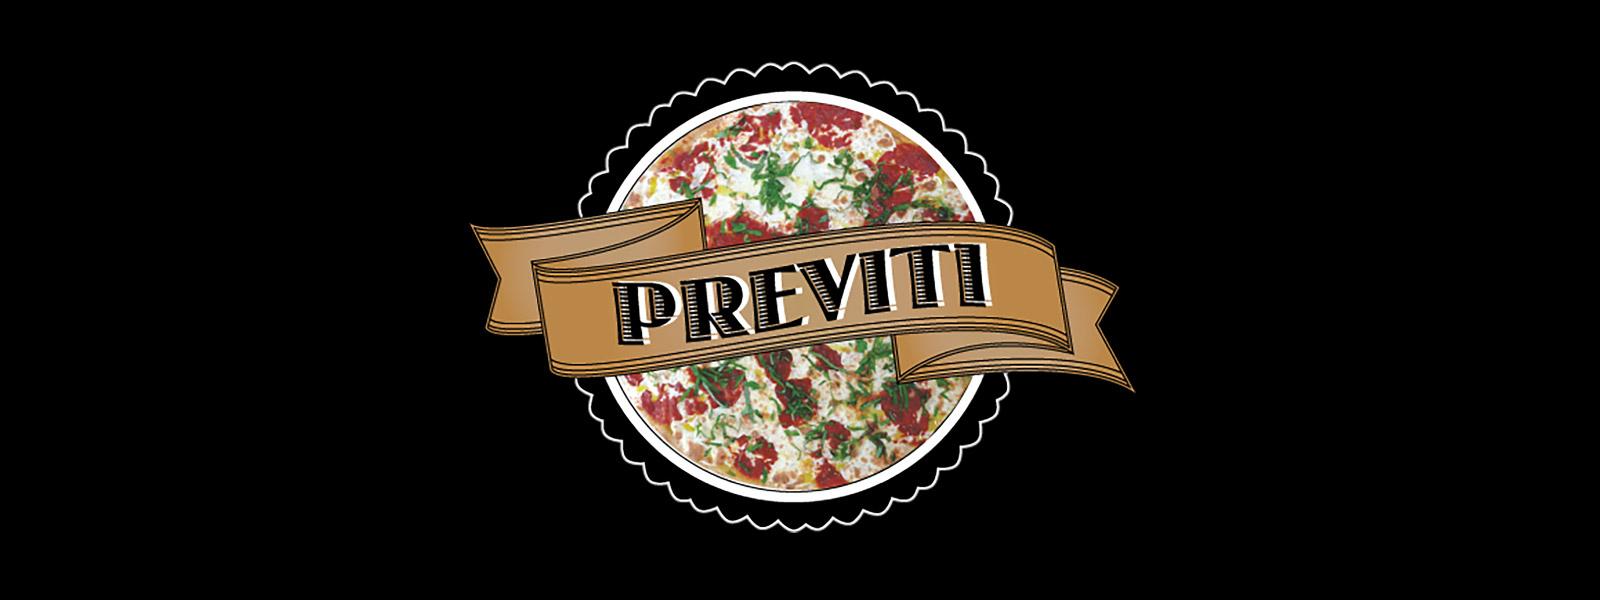 Preveitti-Pizza-header